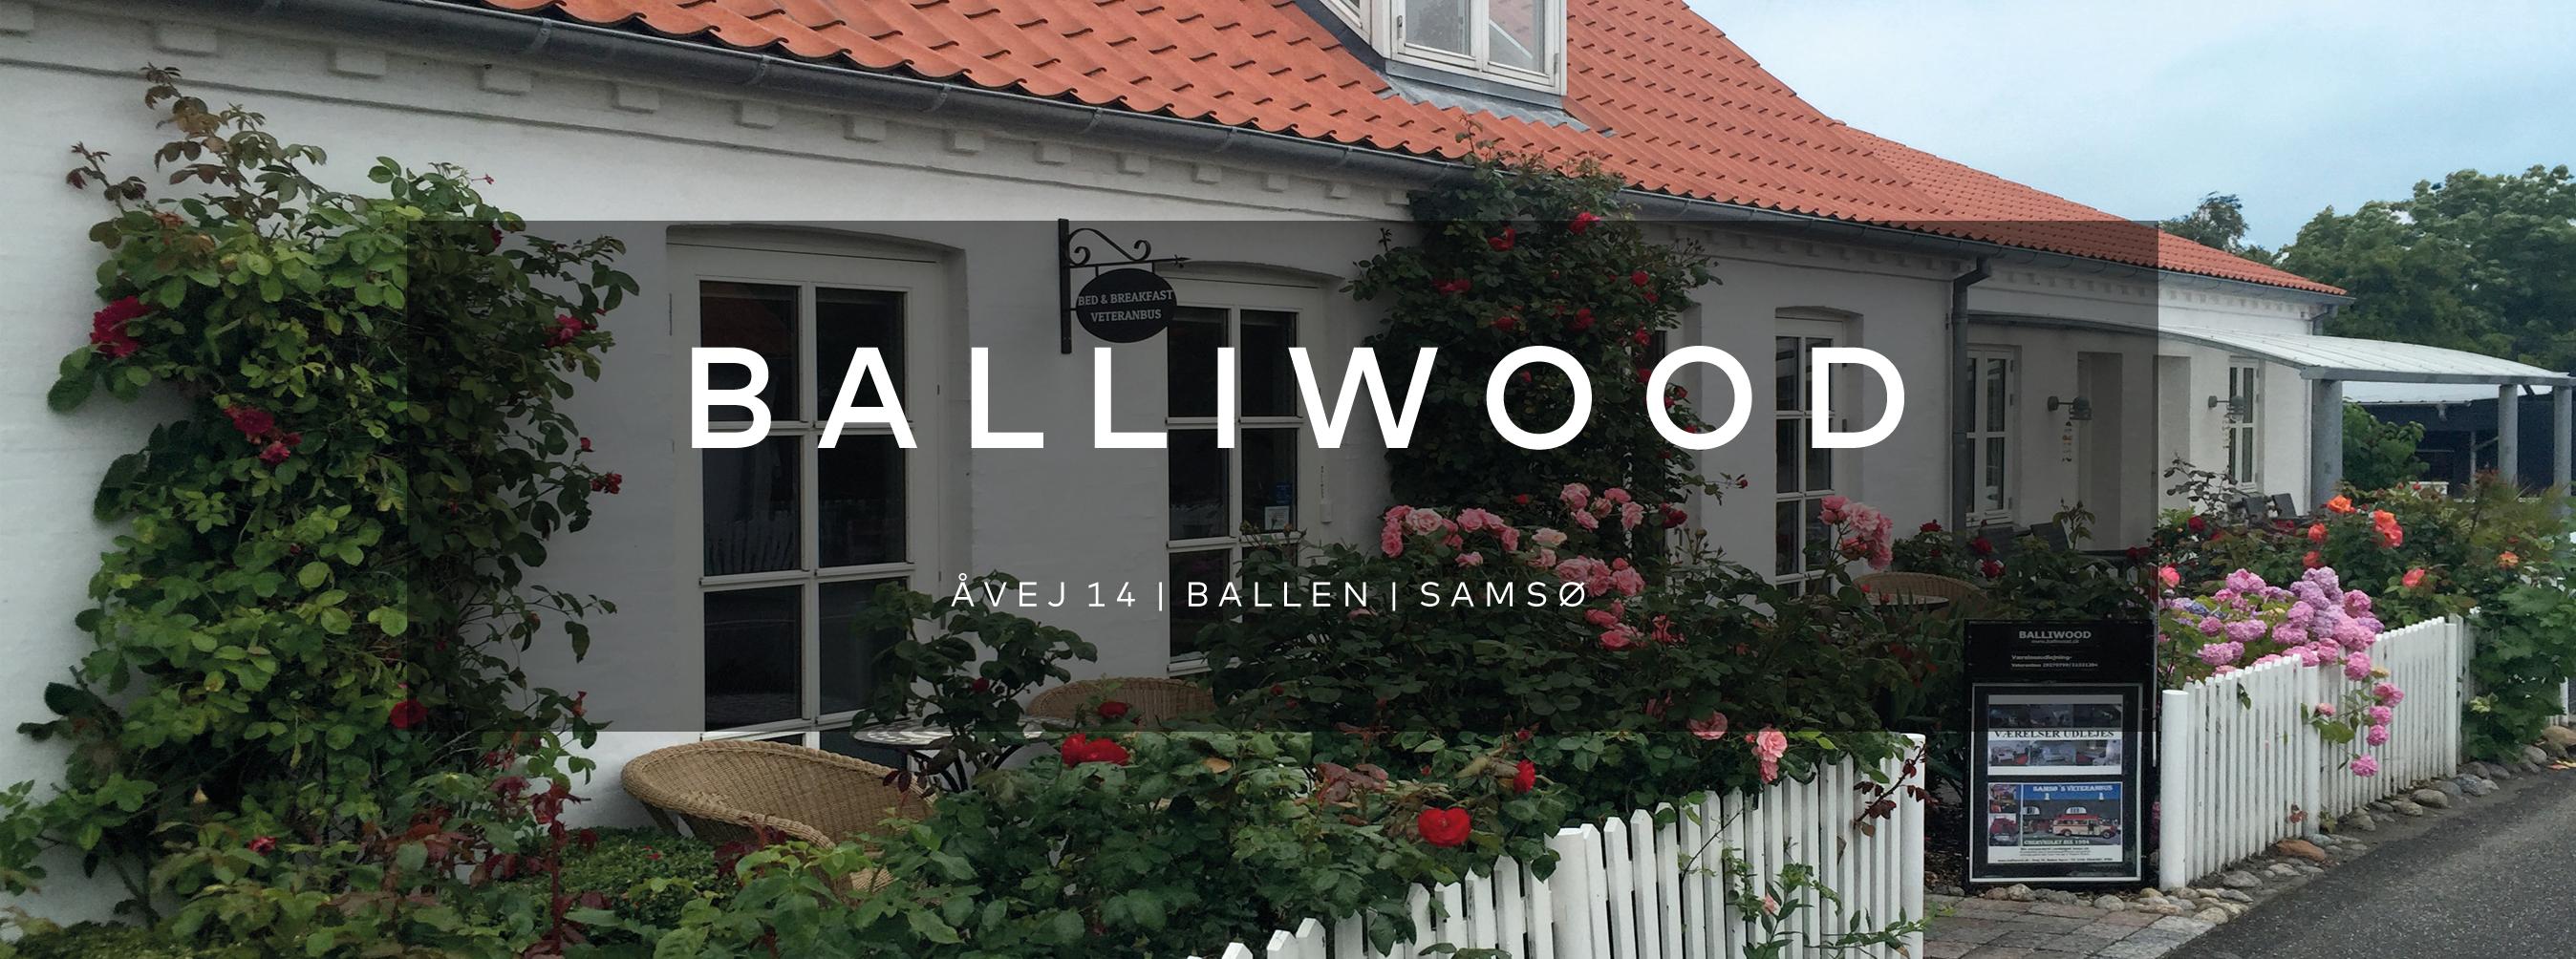 BALLIWOOD-FORSIDE